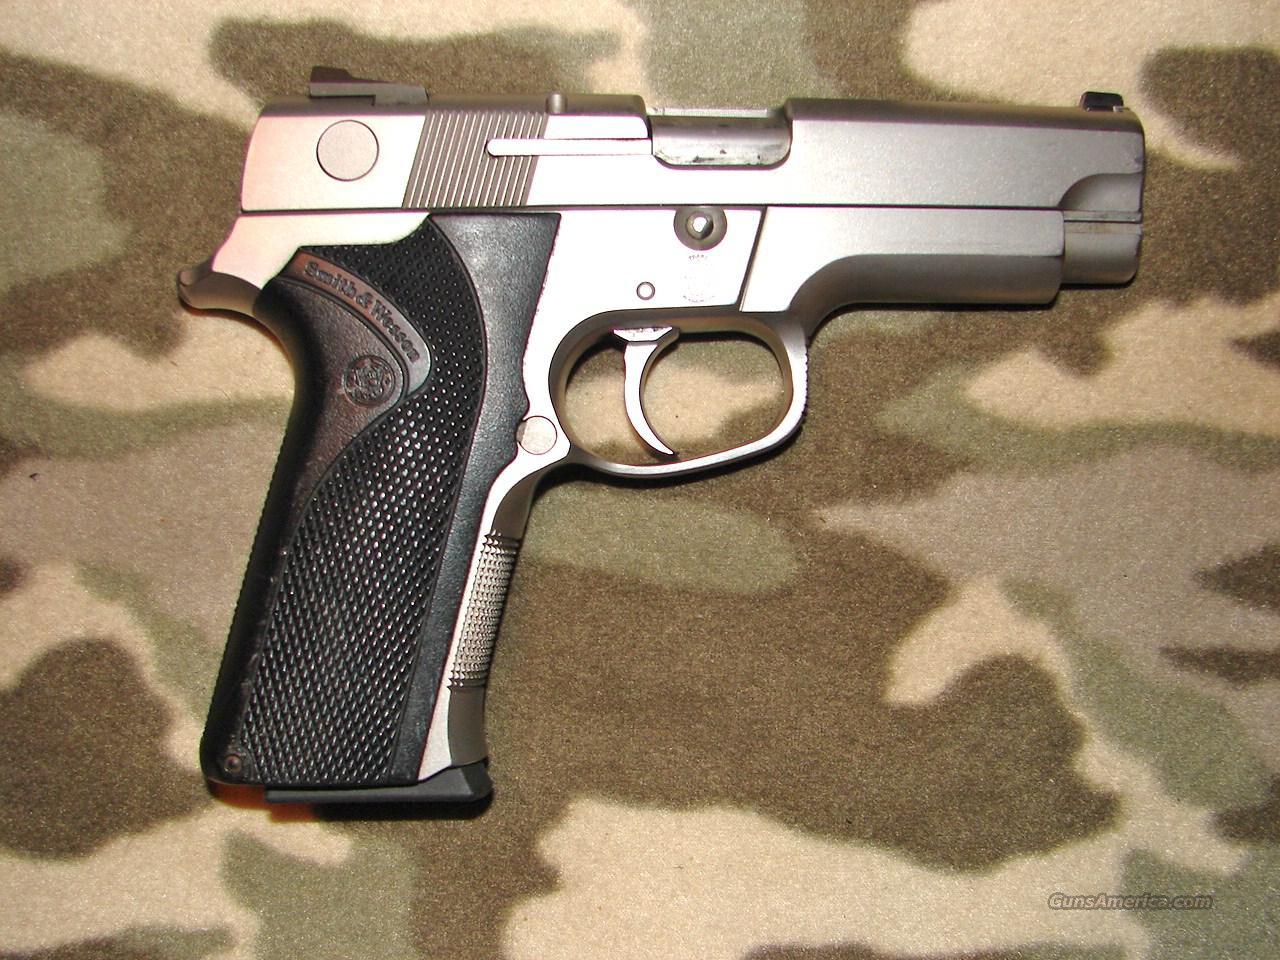 Smith & Wesson 4046  Guns > Pistols > Smith & Wesson Pistols - Autos